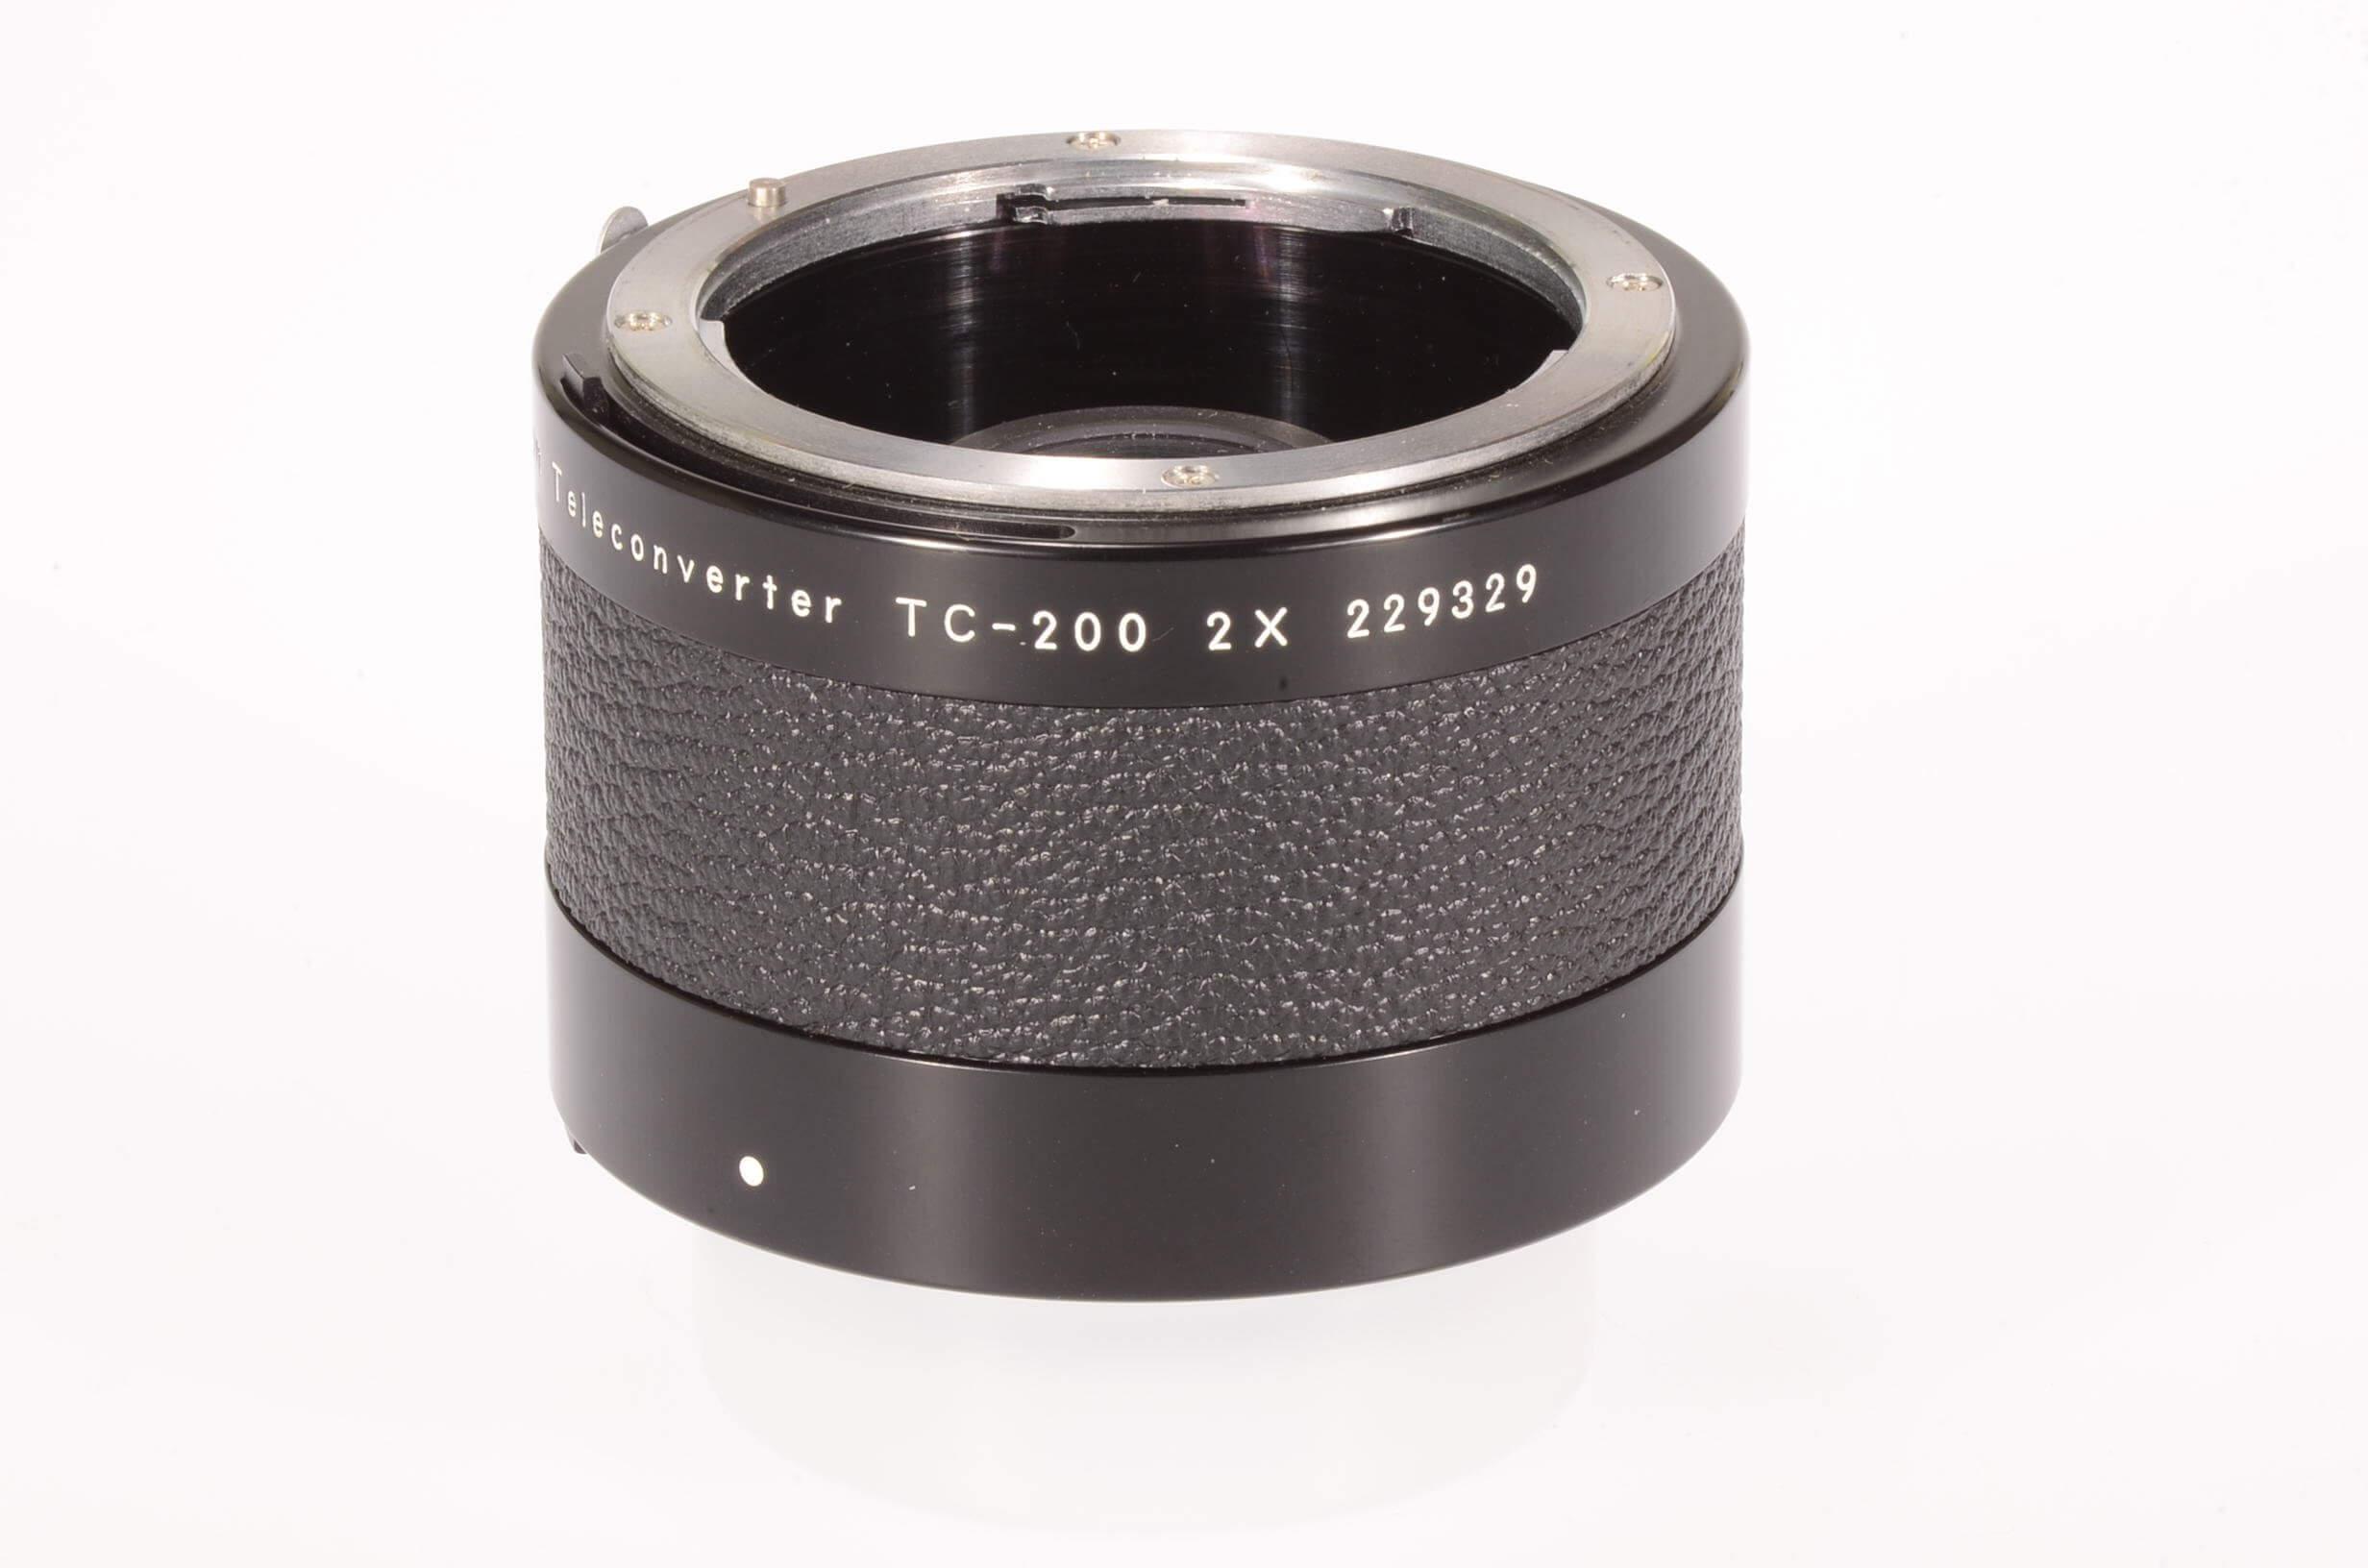 Nikon TC200 teleconverter, almost mint